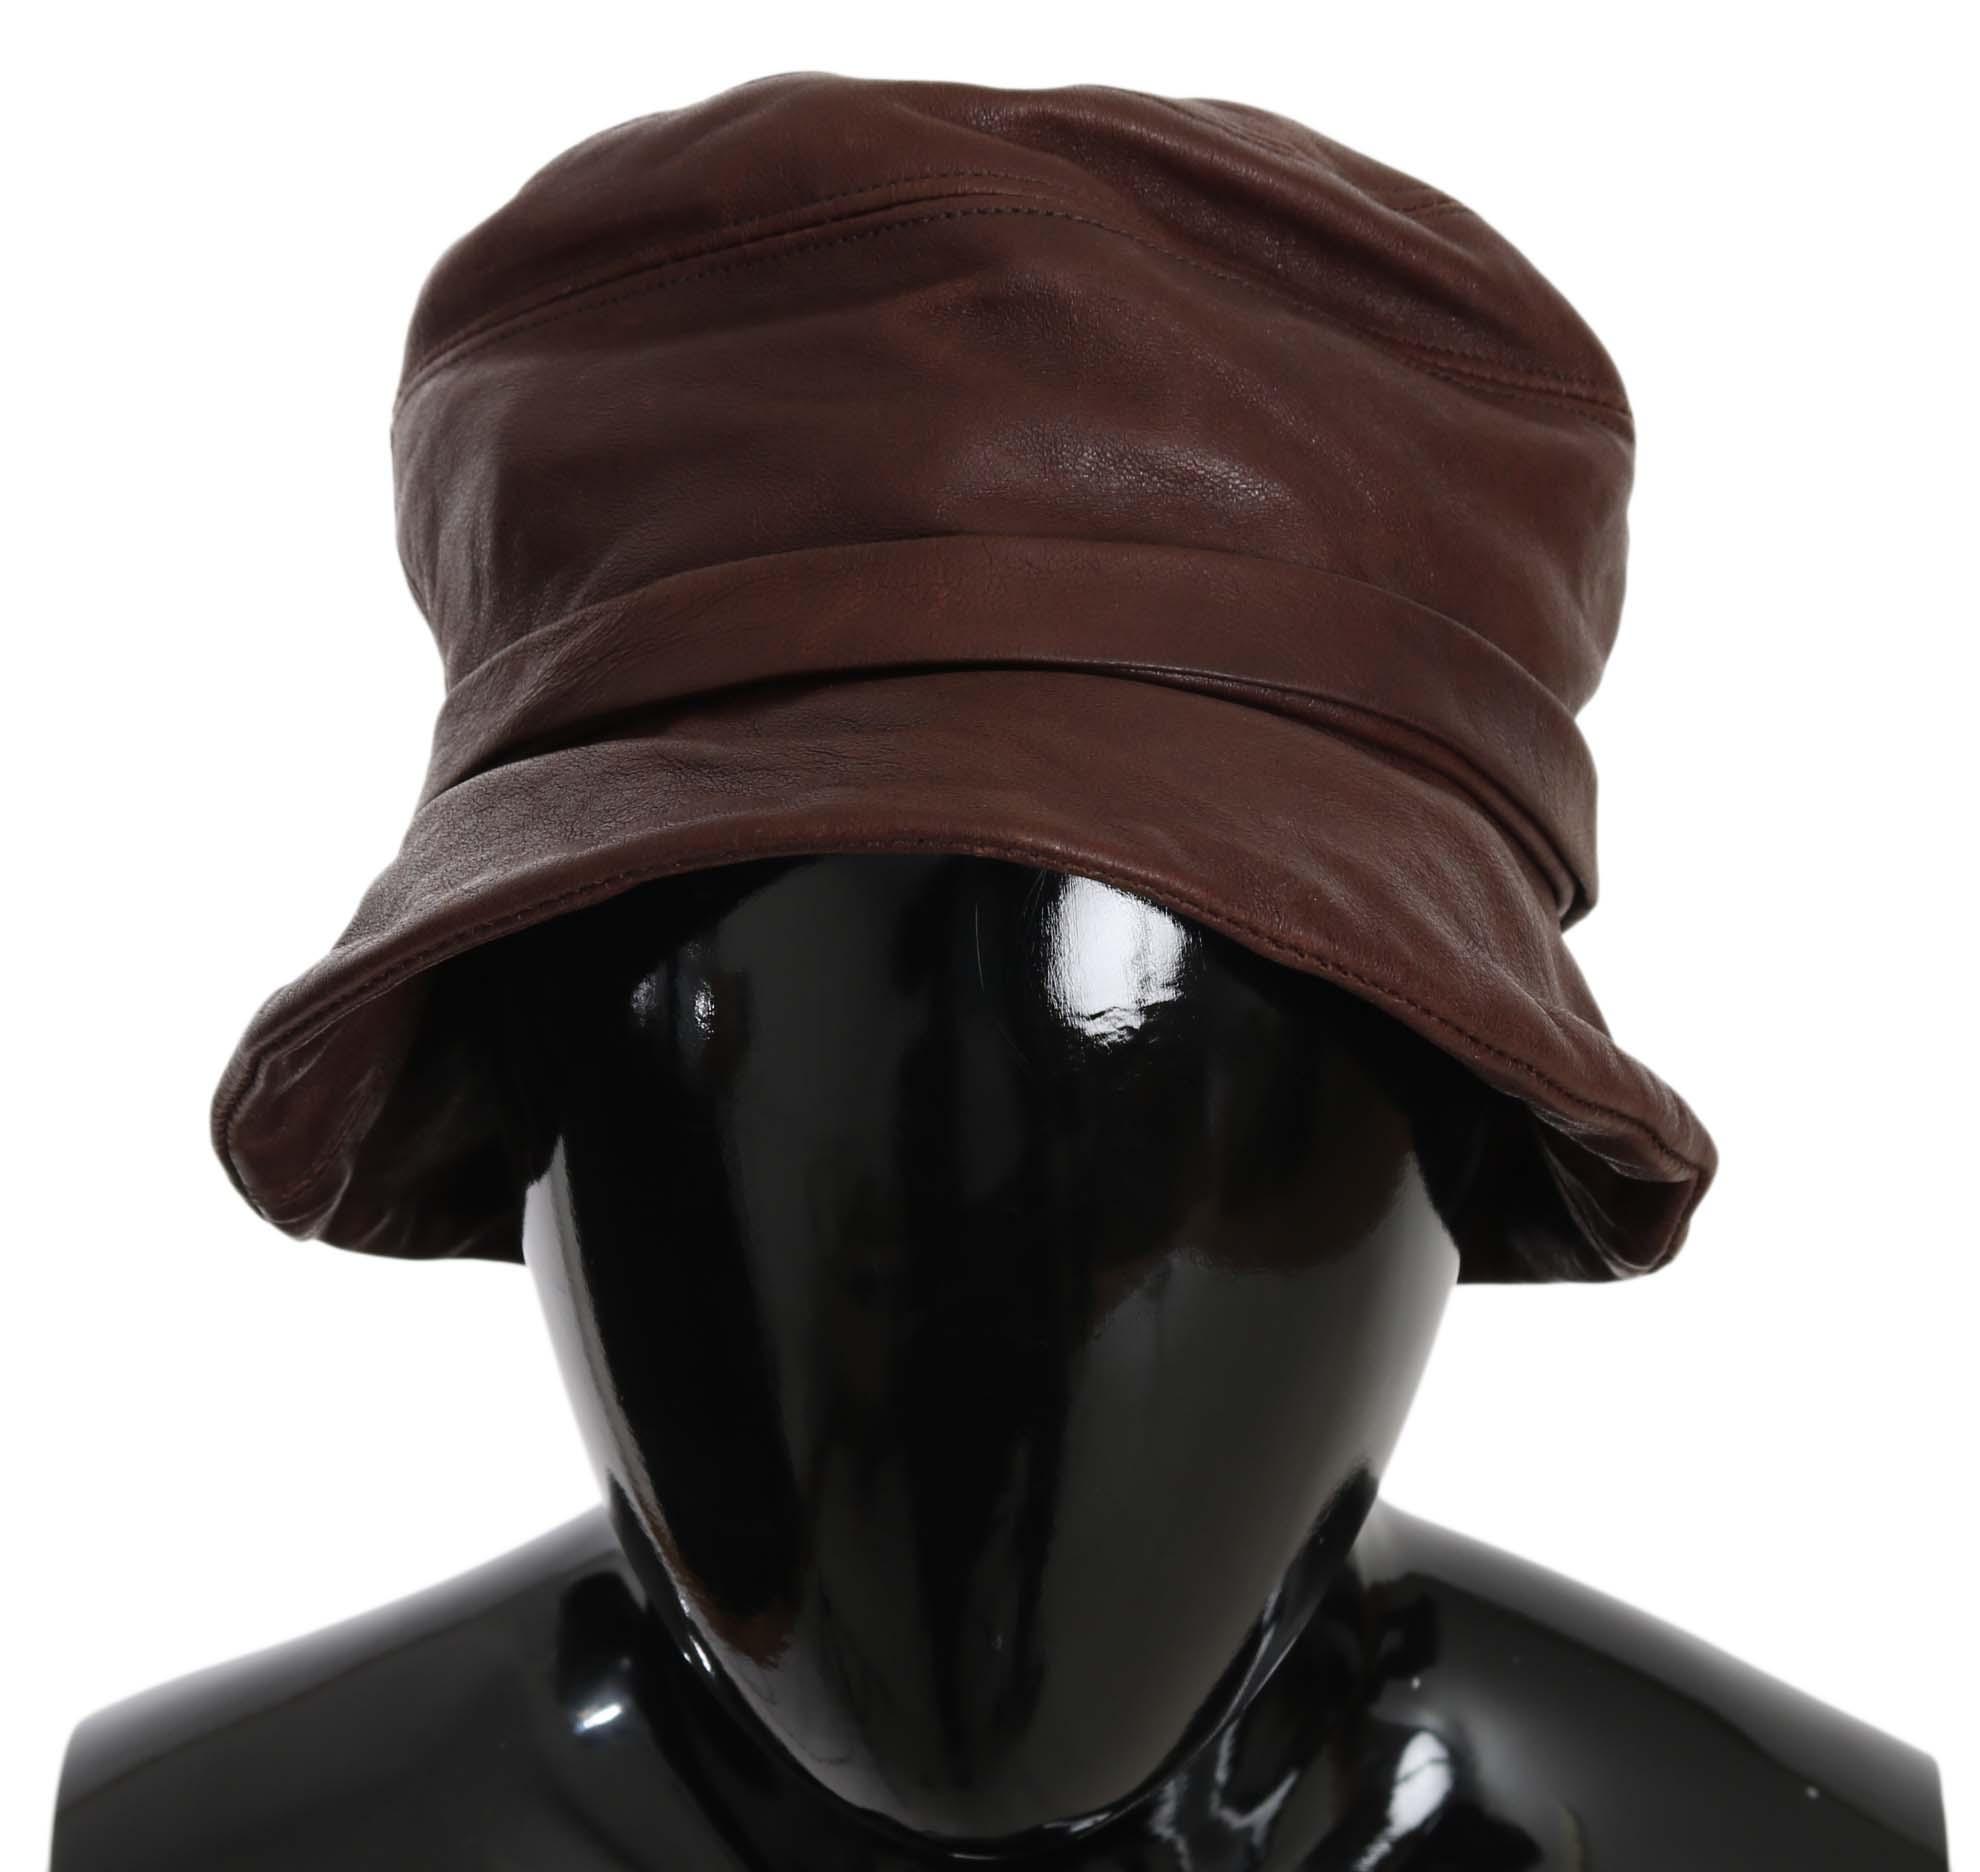 Dolce & Gabbana Women's Hat Brown HAT70215 - 56 cm|XS